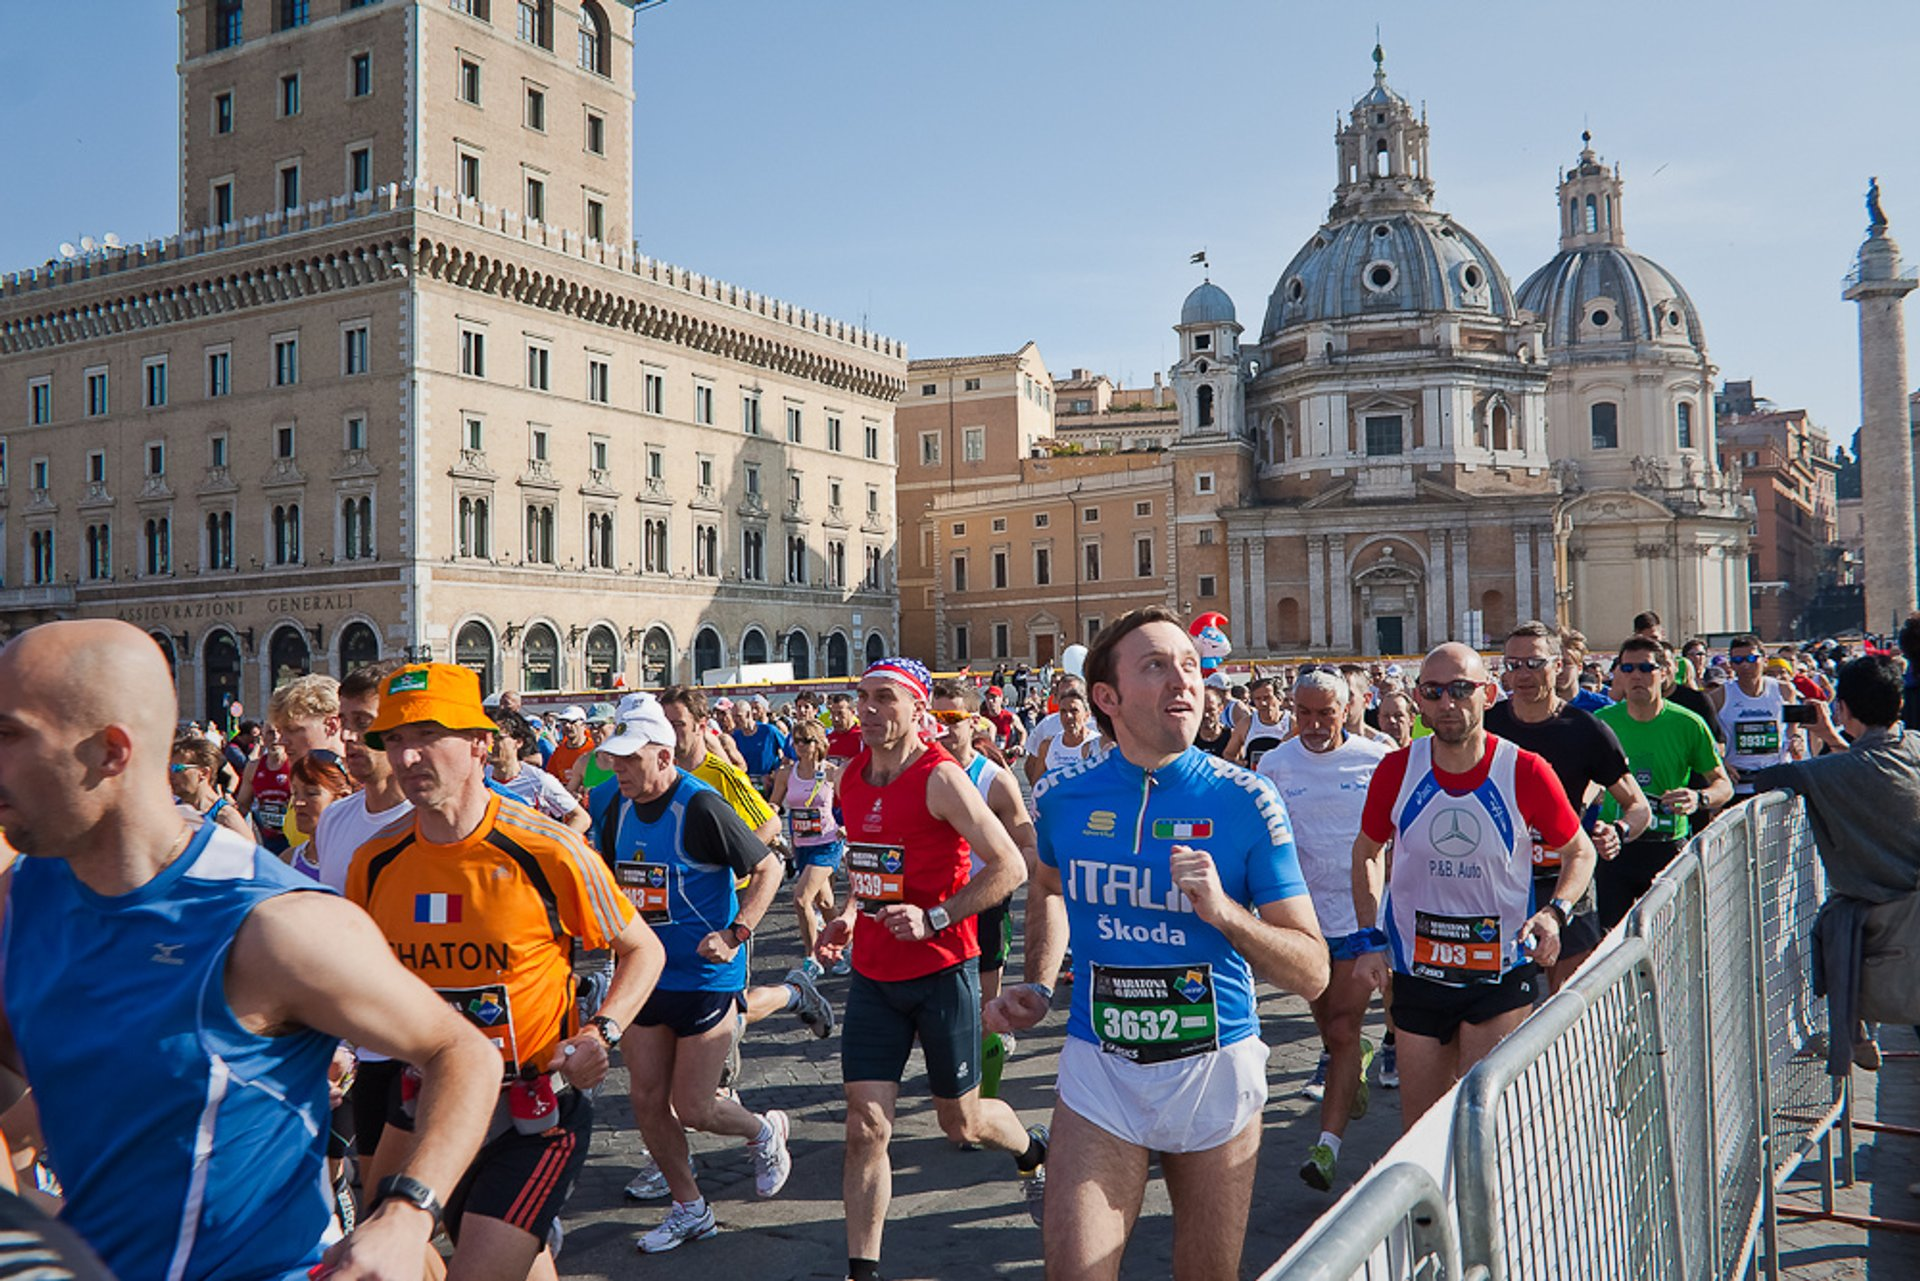 Maratona di Roma (Rome Marathon) in Rome 2020 - Best Time